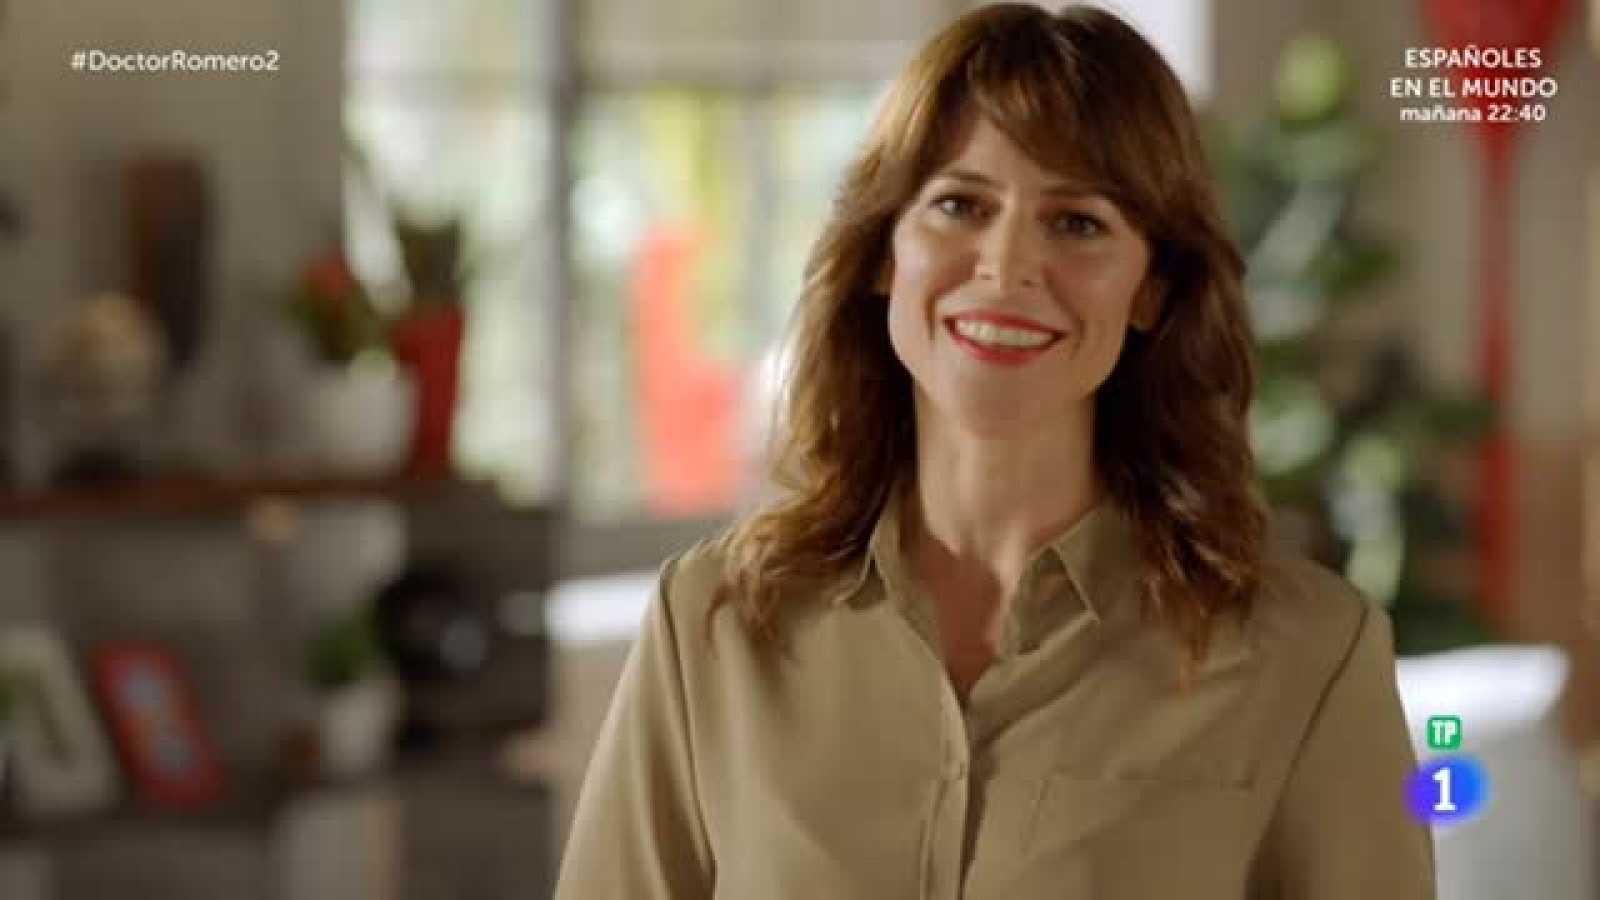 Doctor Romero - Isabel Oñoro pone a prueba a la pareja